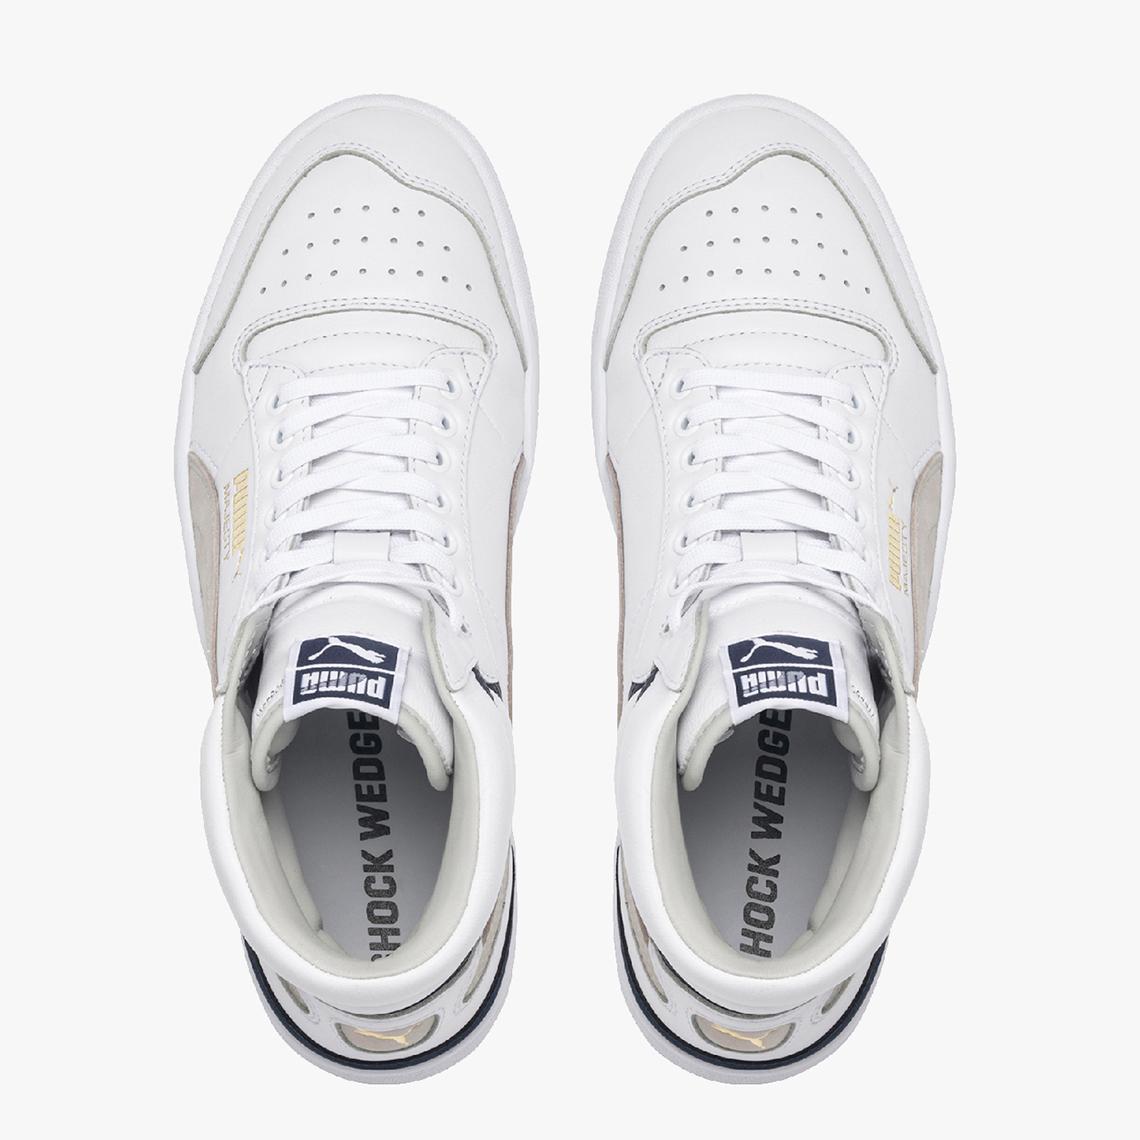 separation shoes b7a57 7d9db Puma Ralph Sampson OG Mid + Low Release Date   SneakerNews.com